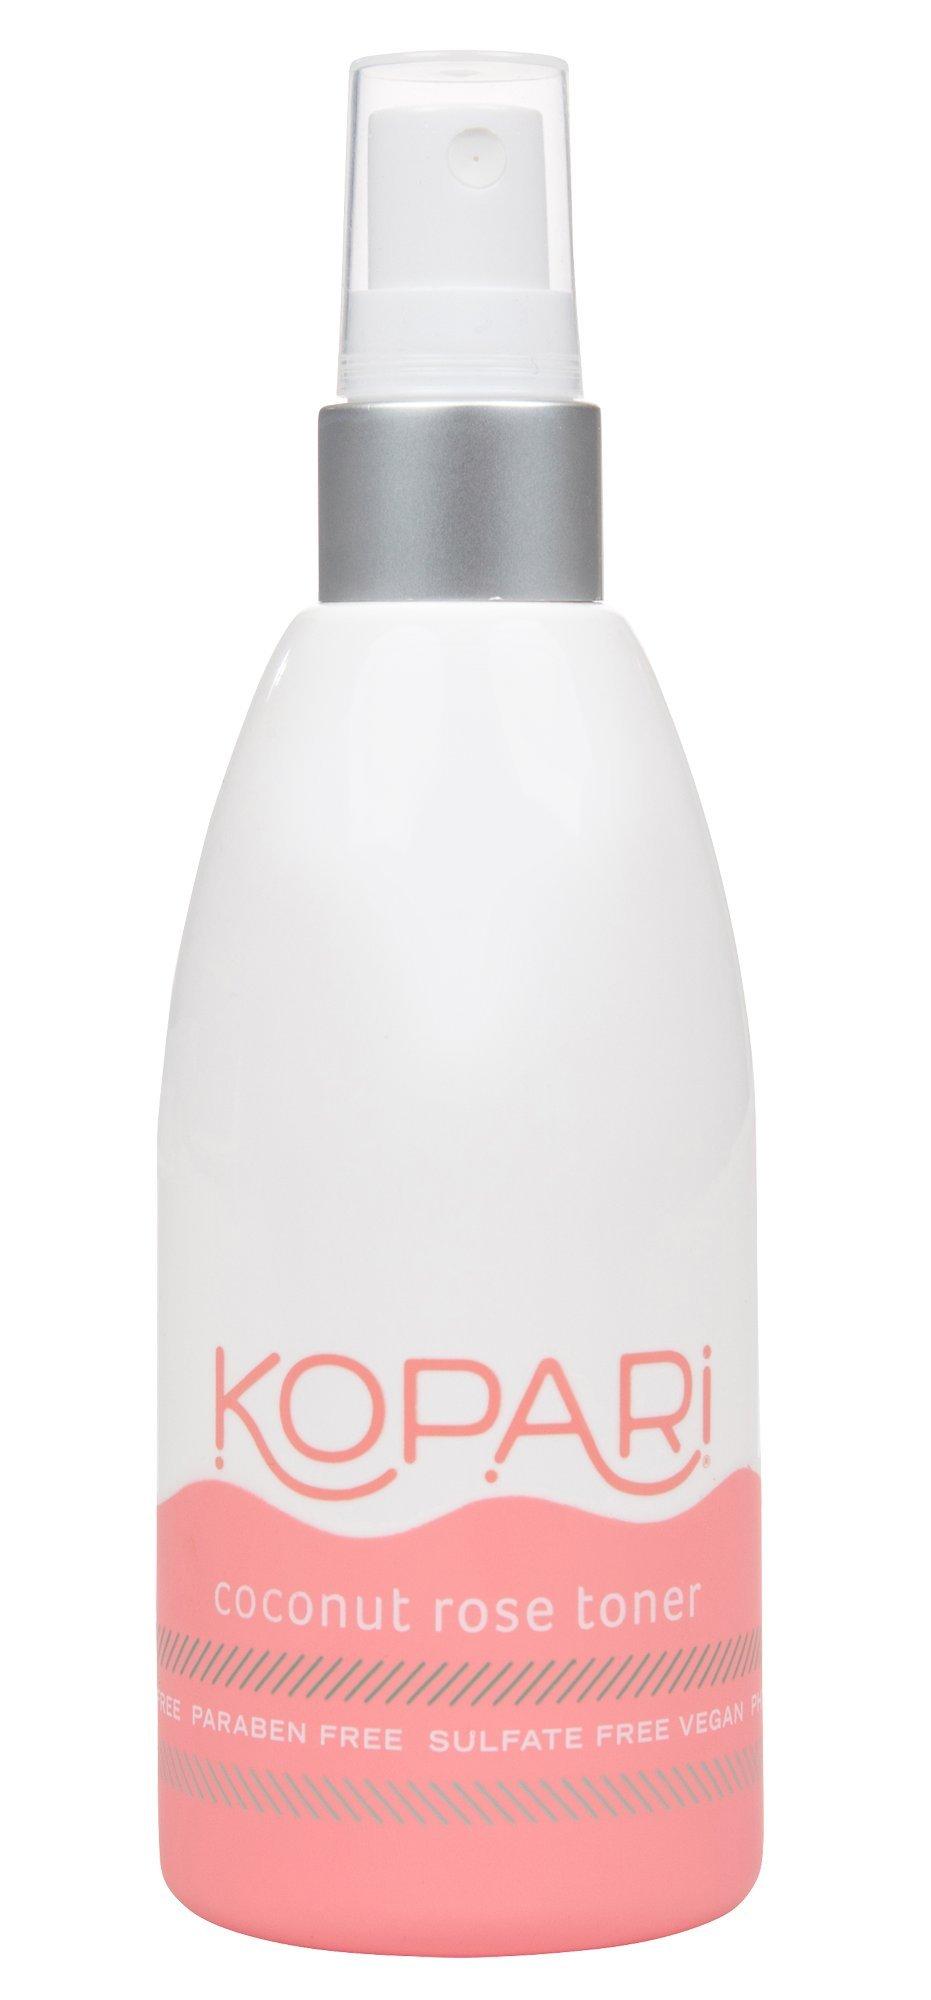 Kopari Coconut Rose Toner - Revitalize and Restore Skin + Calming Witch Hazel - Natural astringent, Non GMO, Vegan, Cruelty Free, Paraben Free and Sulfate Free, 5.1 Oz